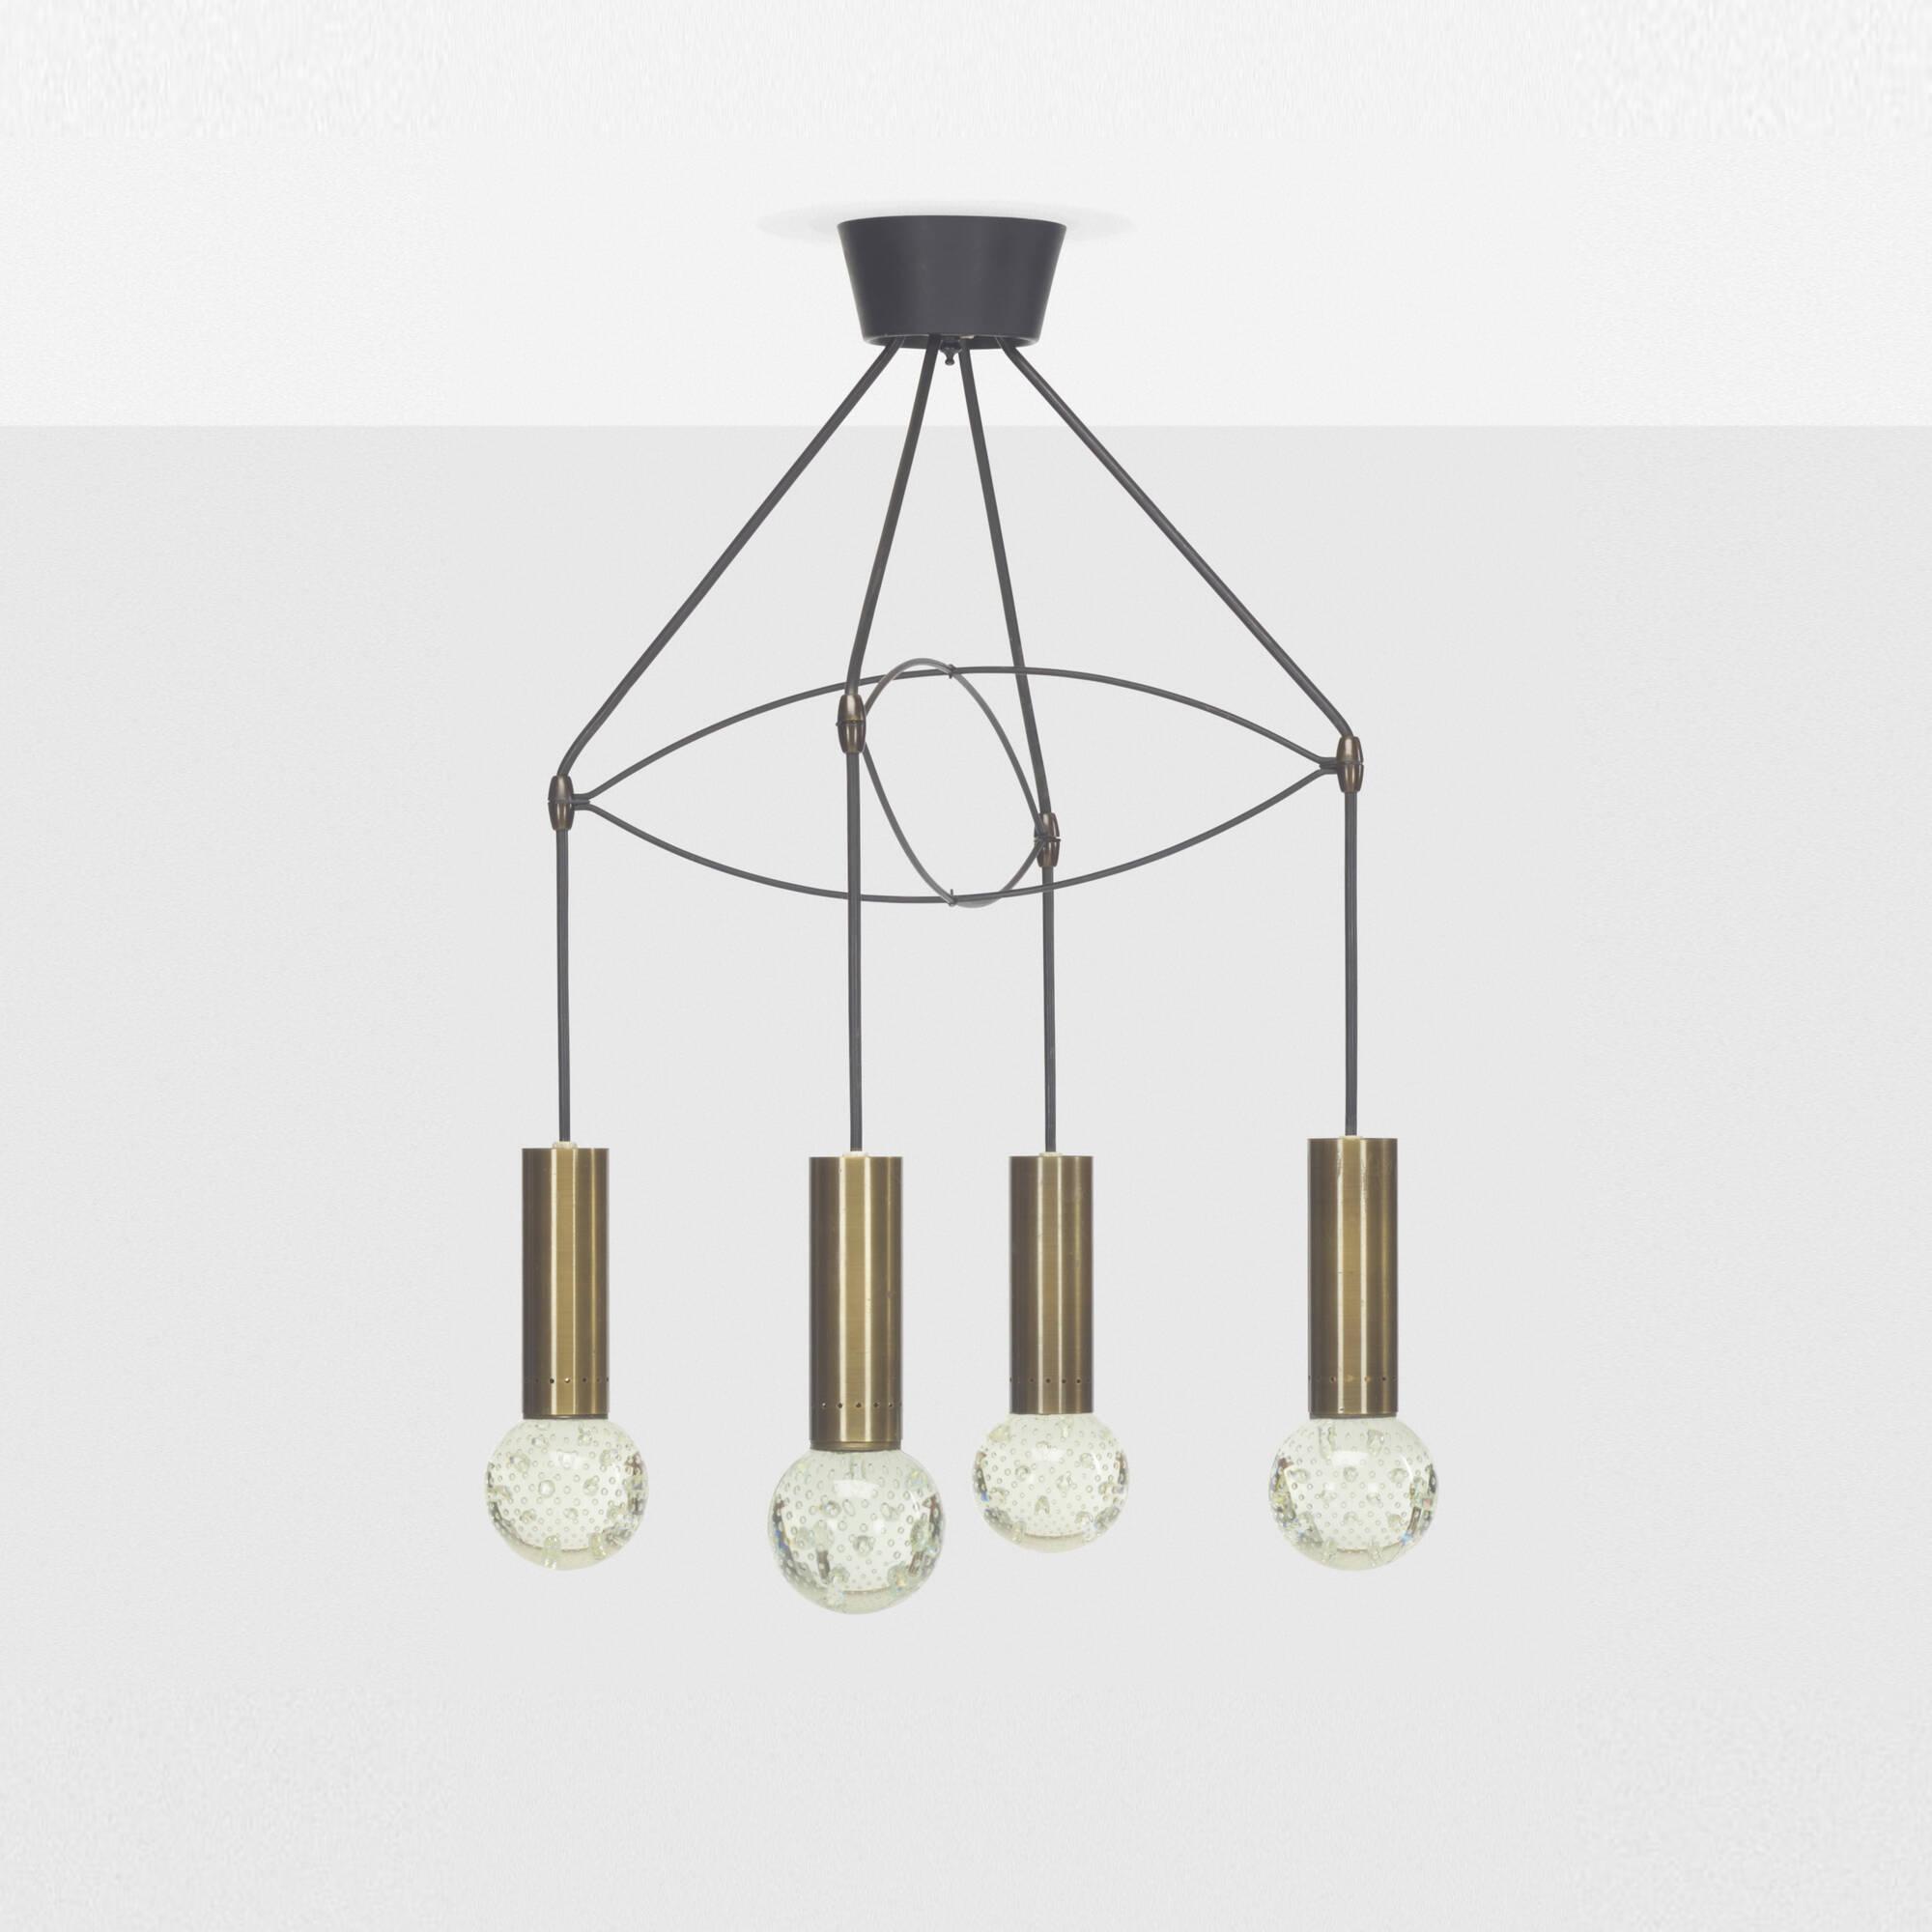 293: Italian / hanging lamp (1 of 1)